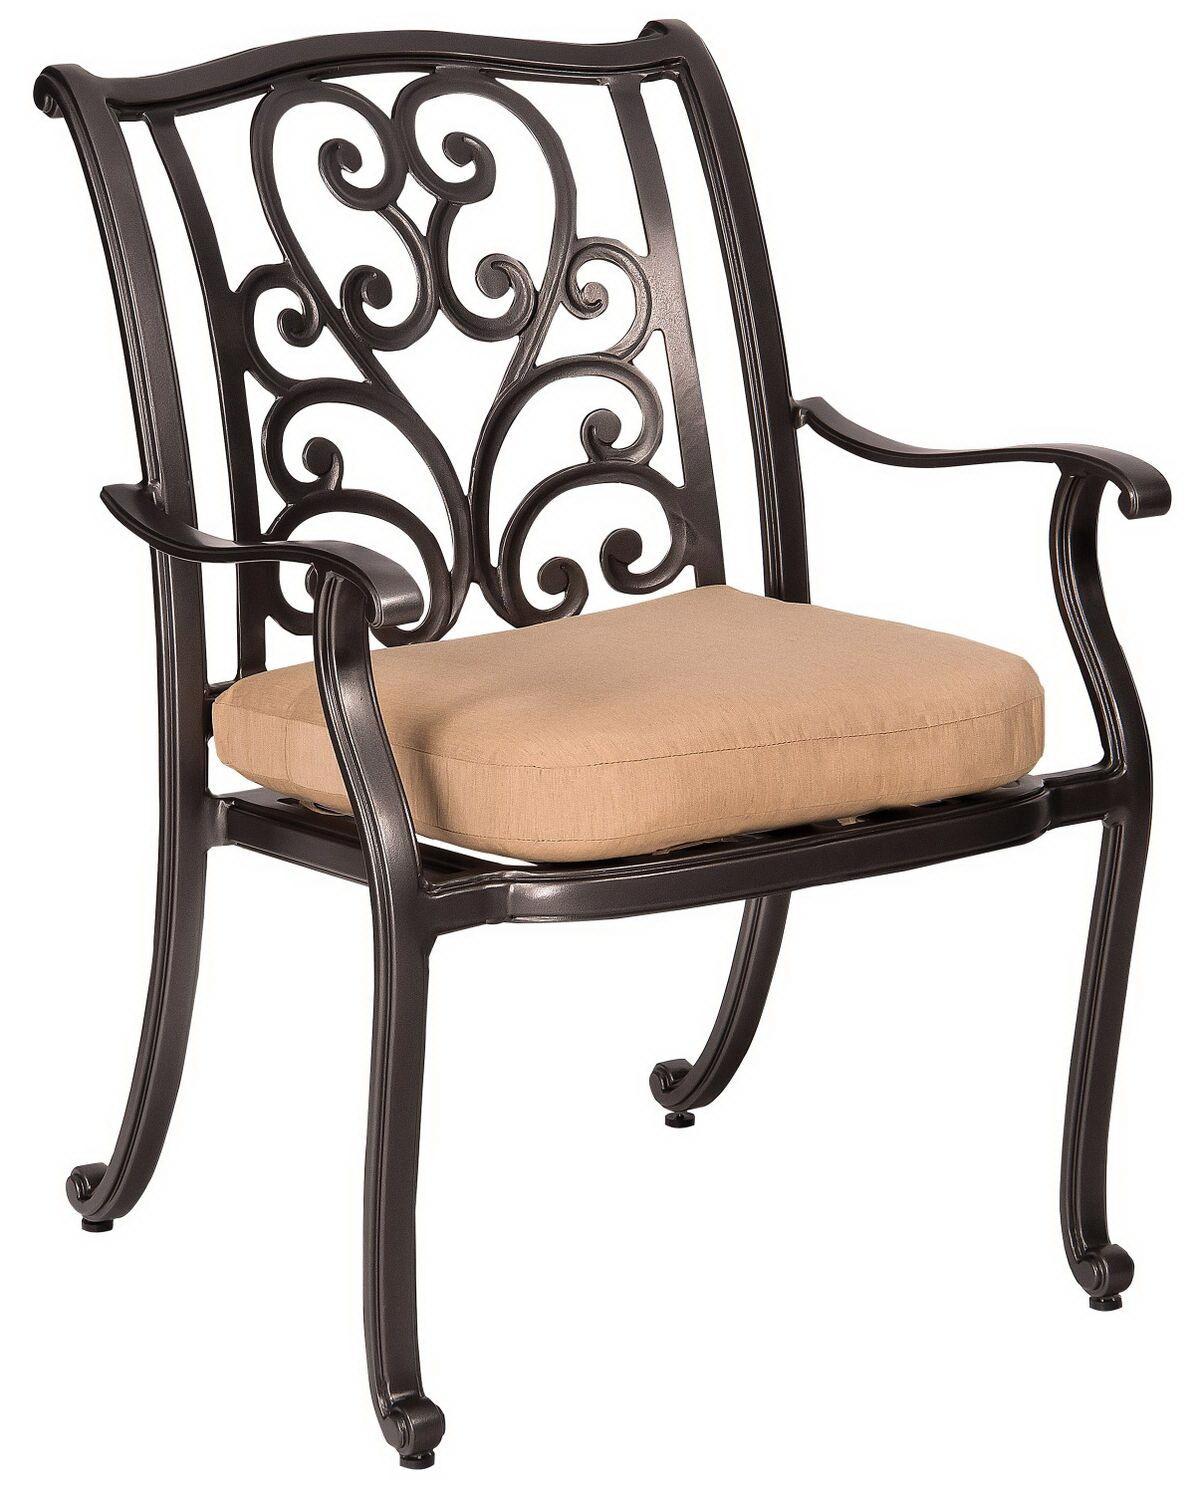 Dining Arm Chair By Woodard 3W0417